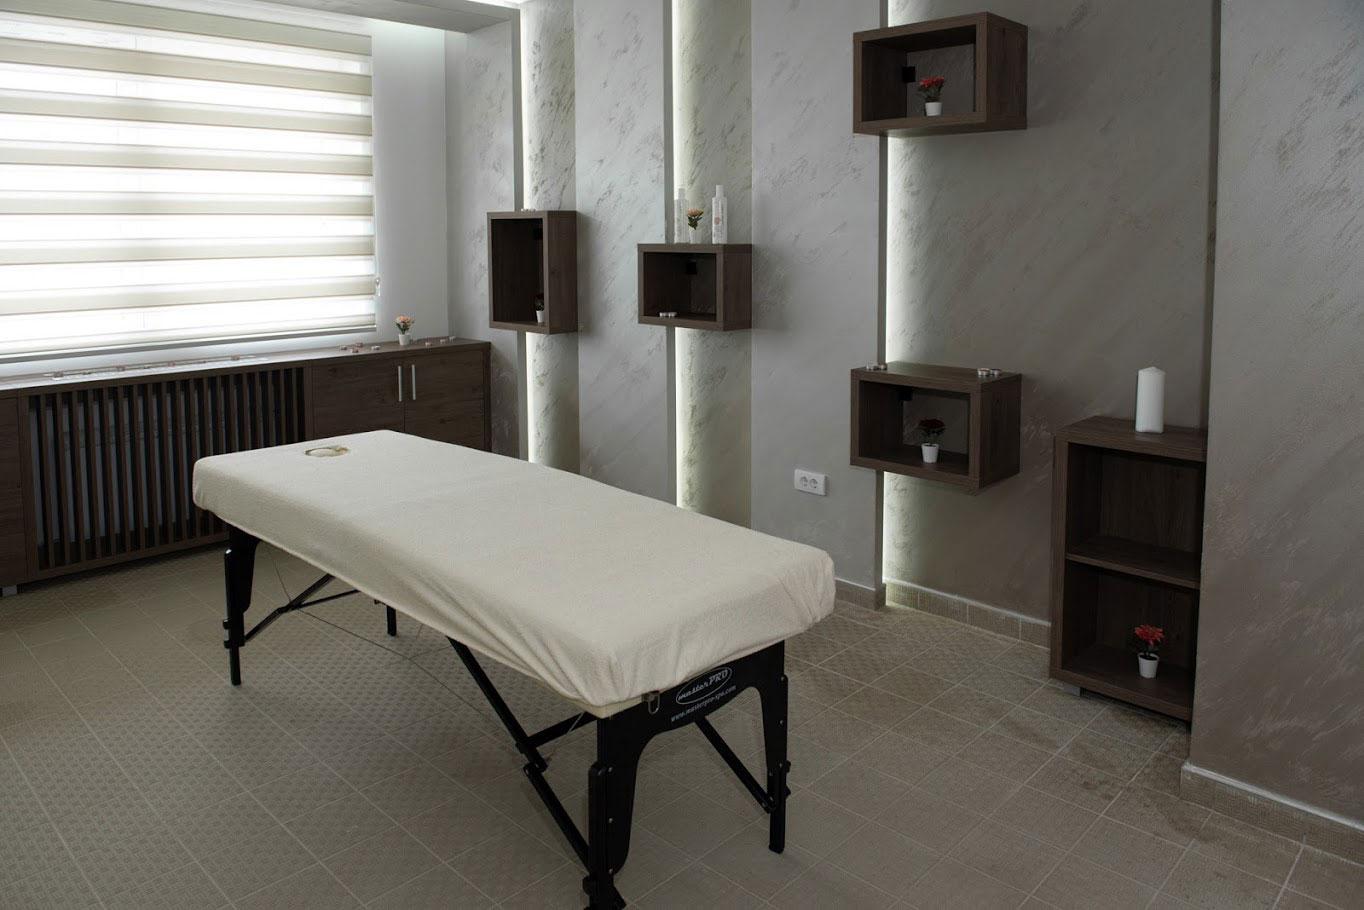 Soba za masazu - Wellness & Spa centar - Vrnjacke Terme